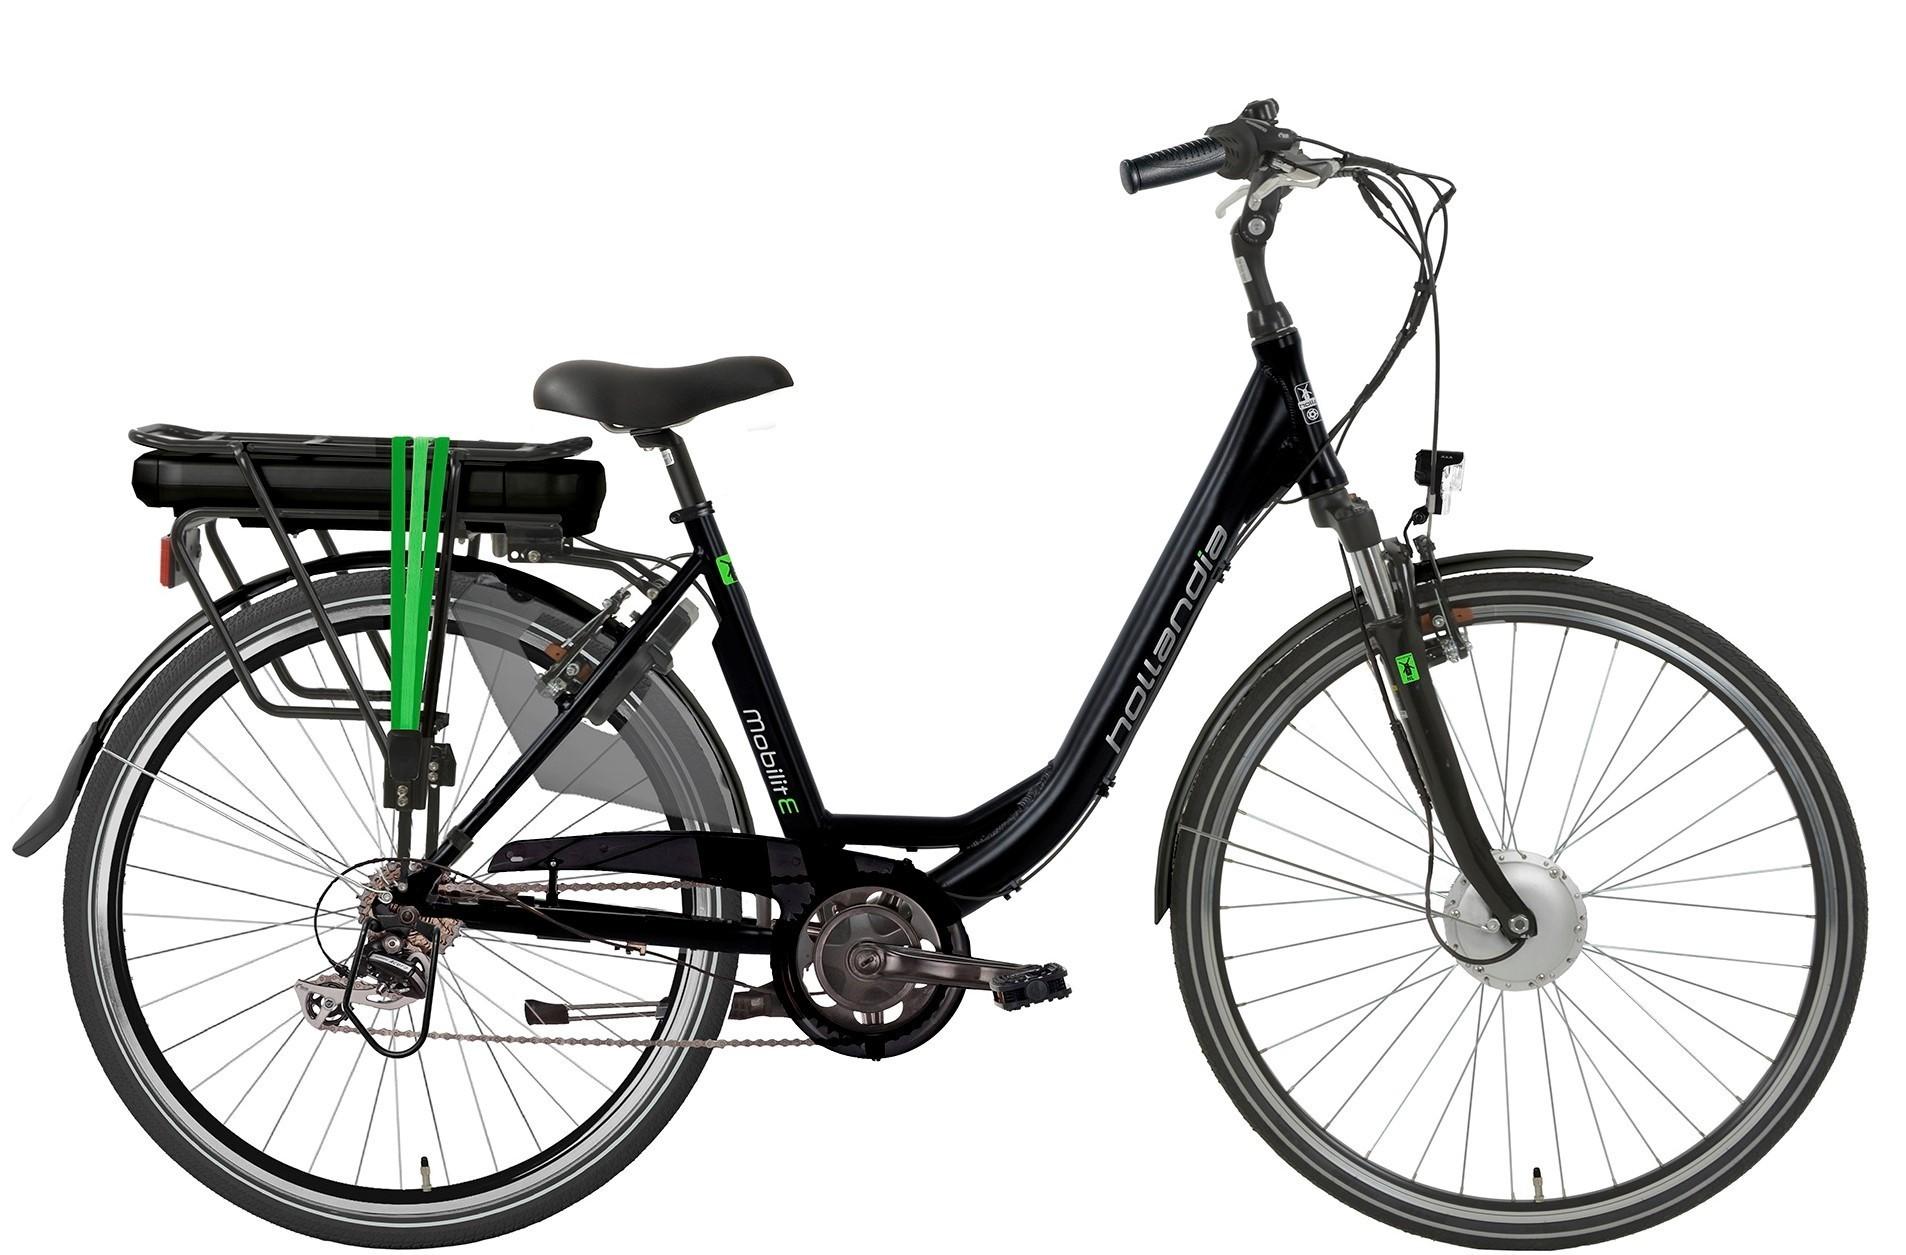 Hollandia Mobilit E-bike 6V met voorwielmotor